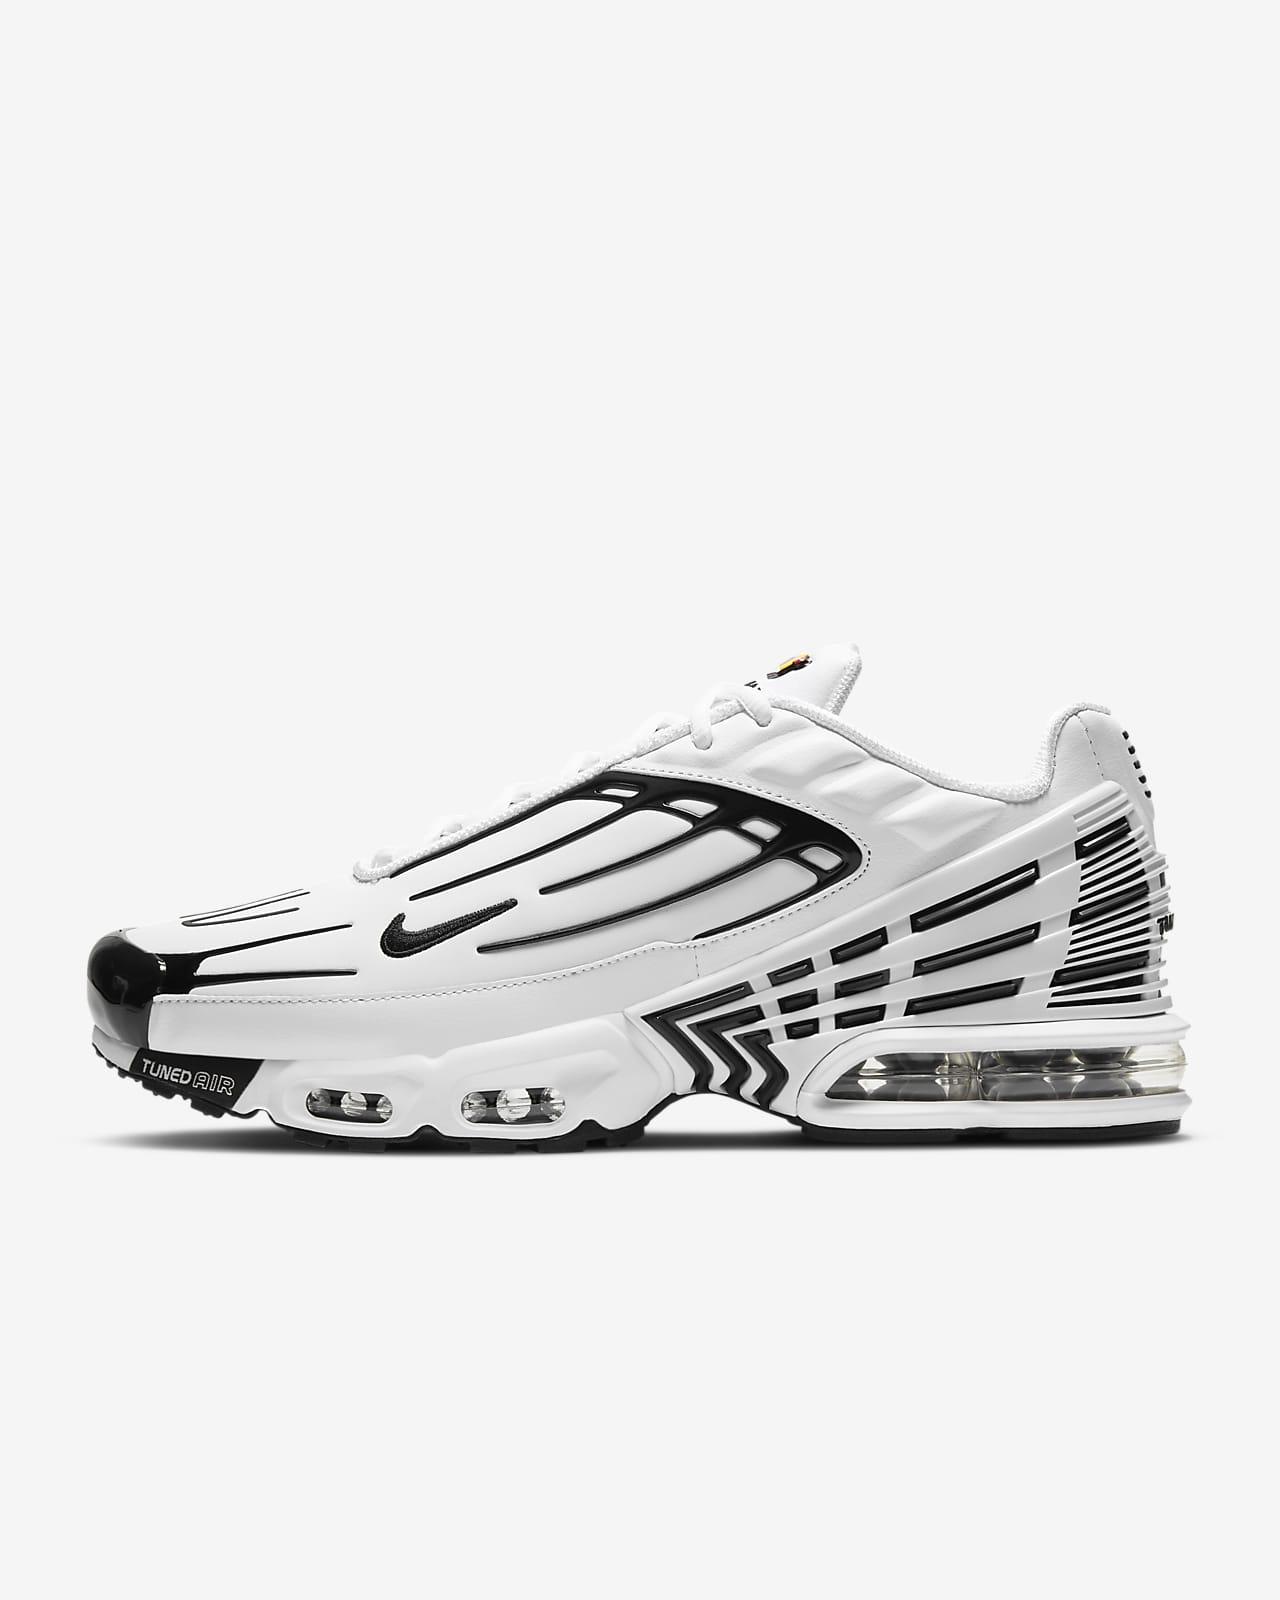 Sko Nike Air Max Plus 3 Leather för män